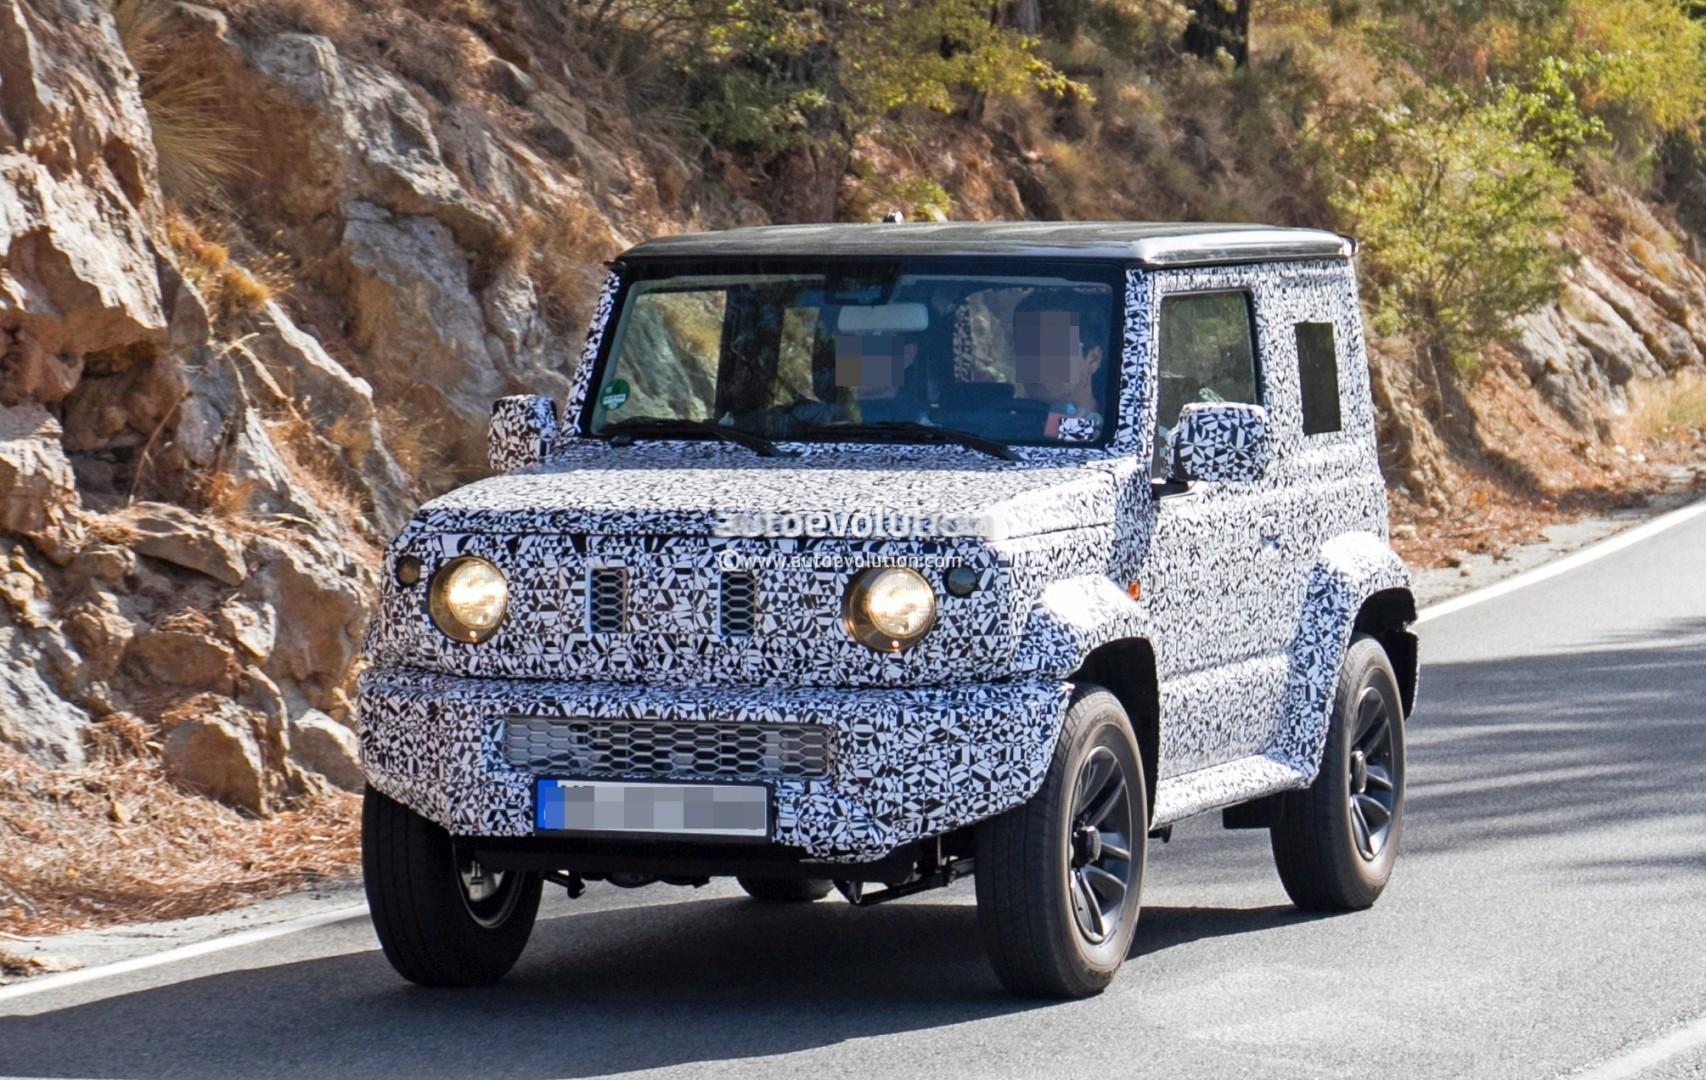 2018 suzuki automobiles. plain automobiles new suzuki jimny spied to 2018 suzuki automobiles e